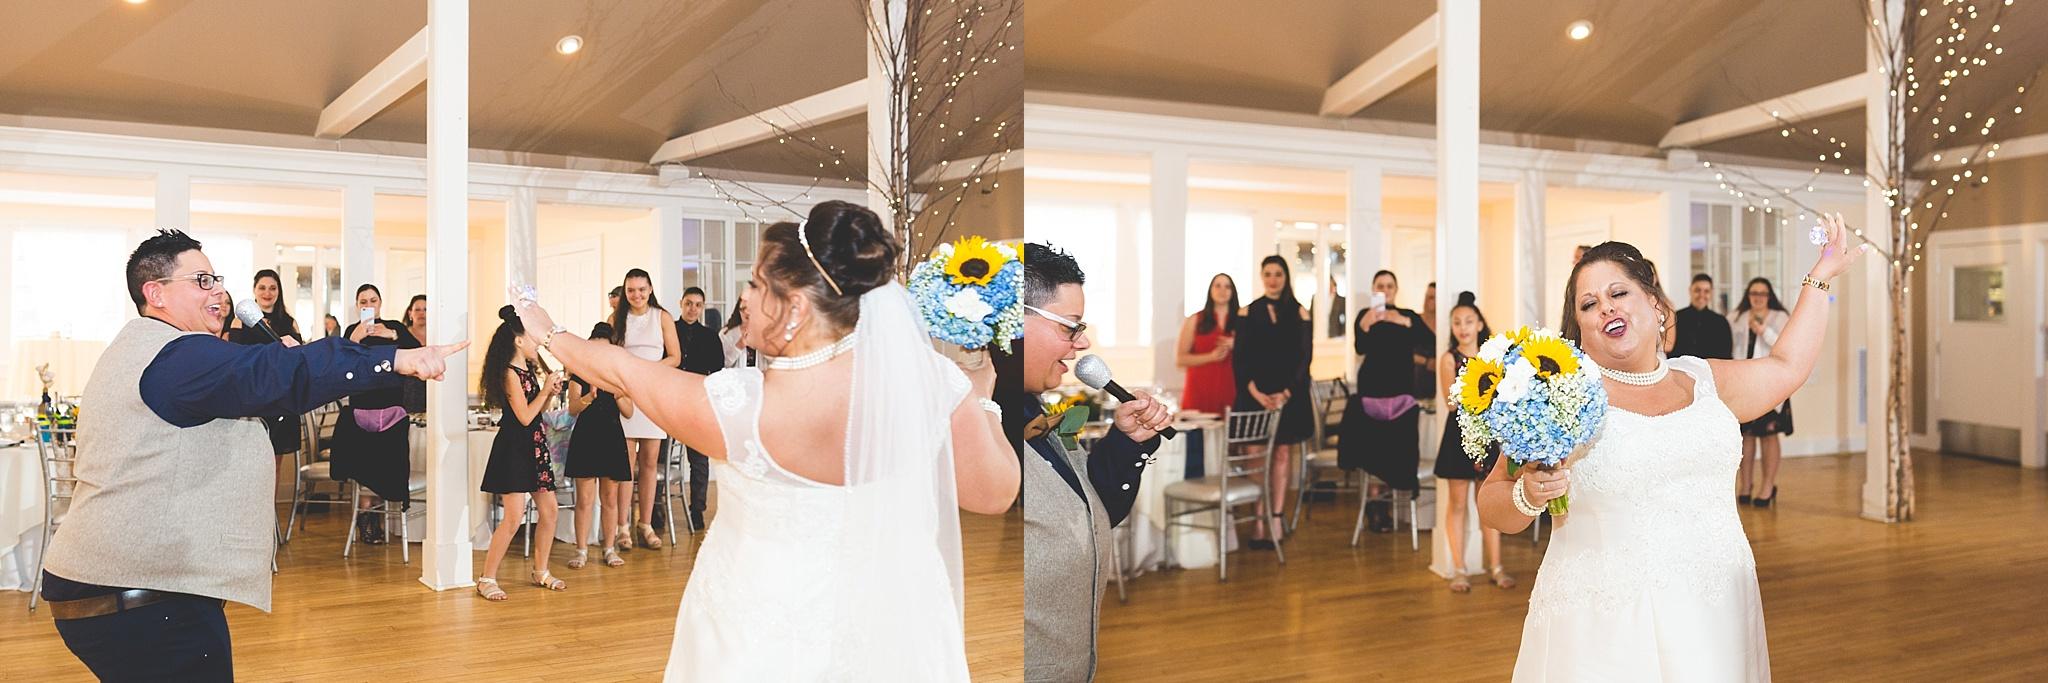 Albany_Wedding_Photographer_1673.jpg